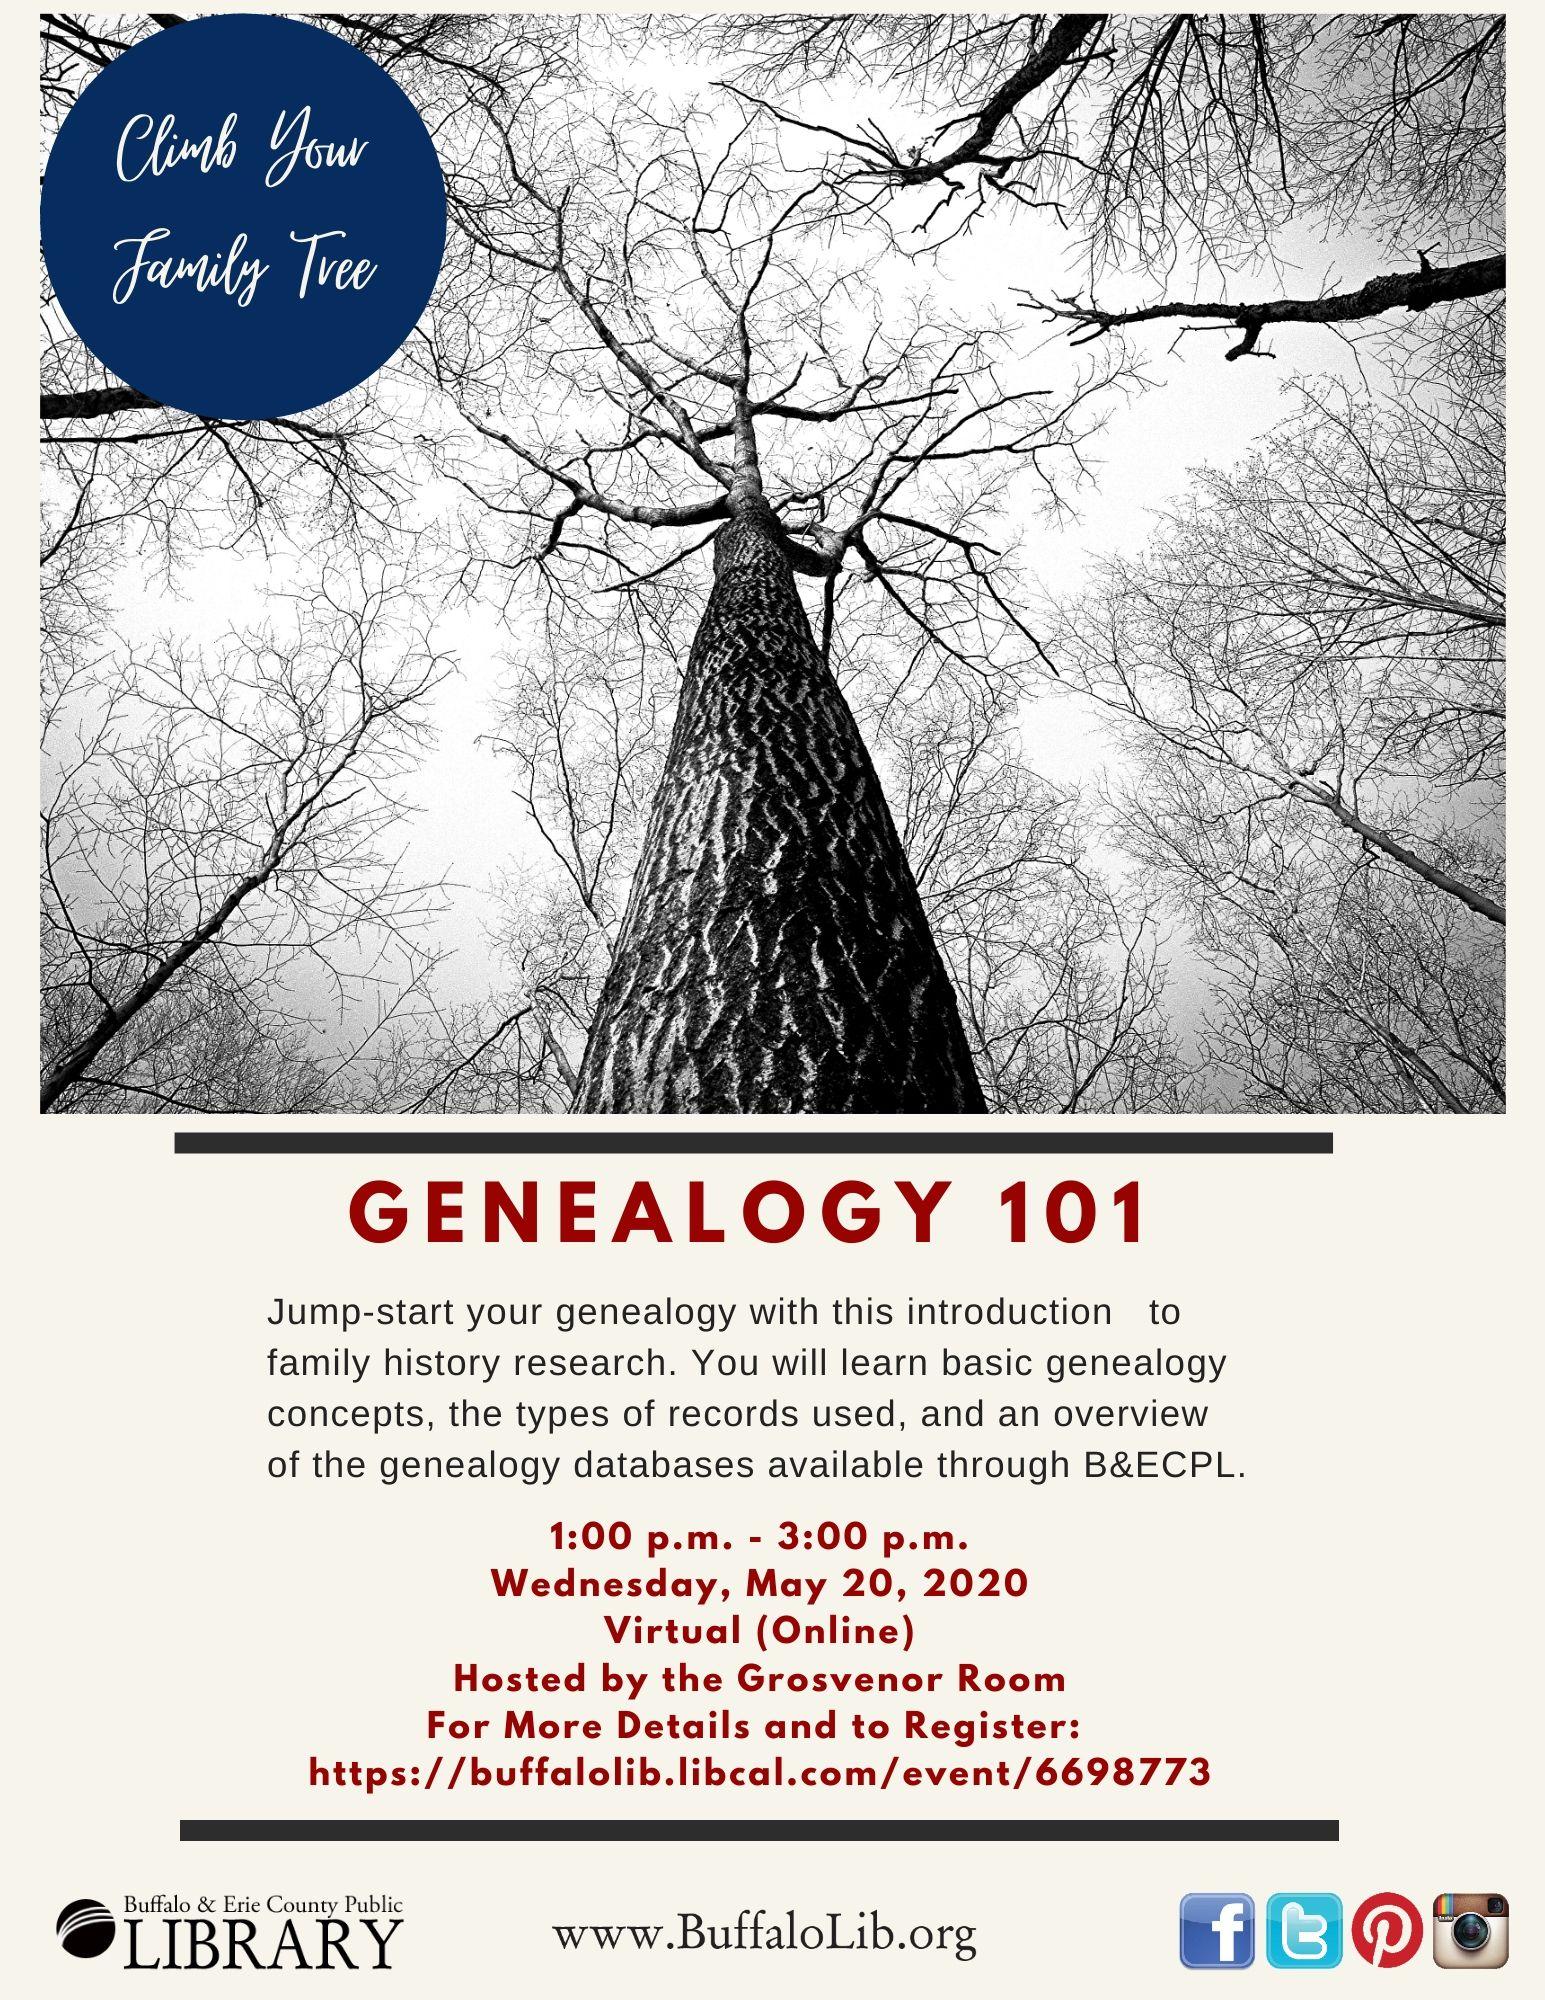 Virtual (online) Genealogy 101